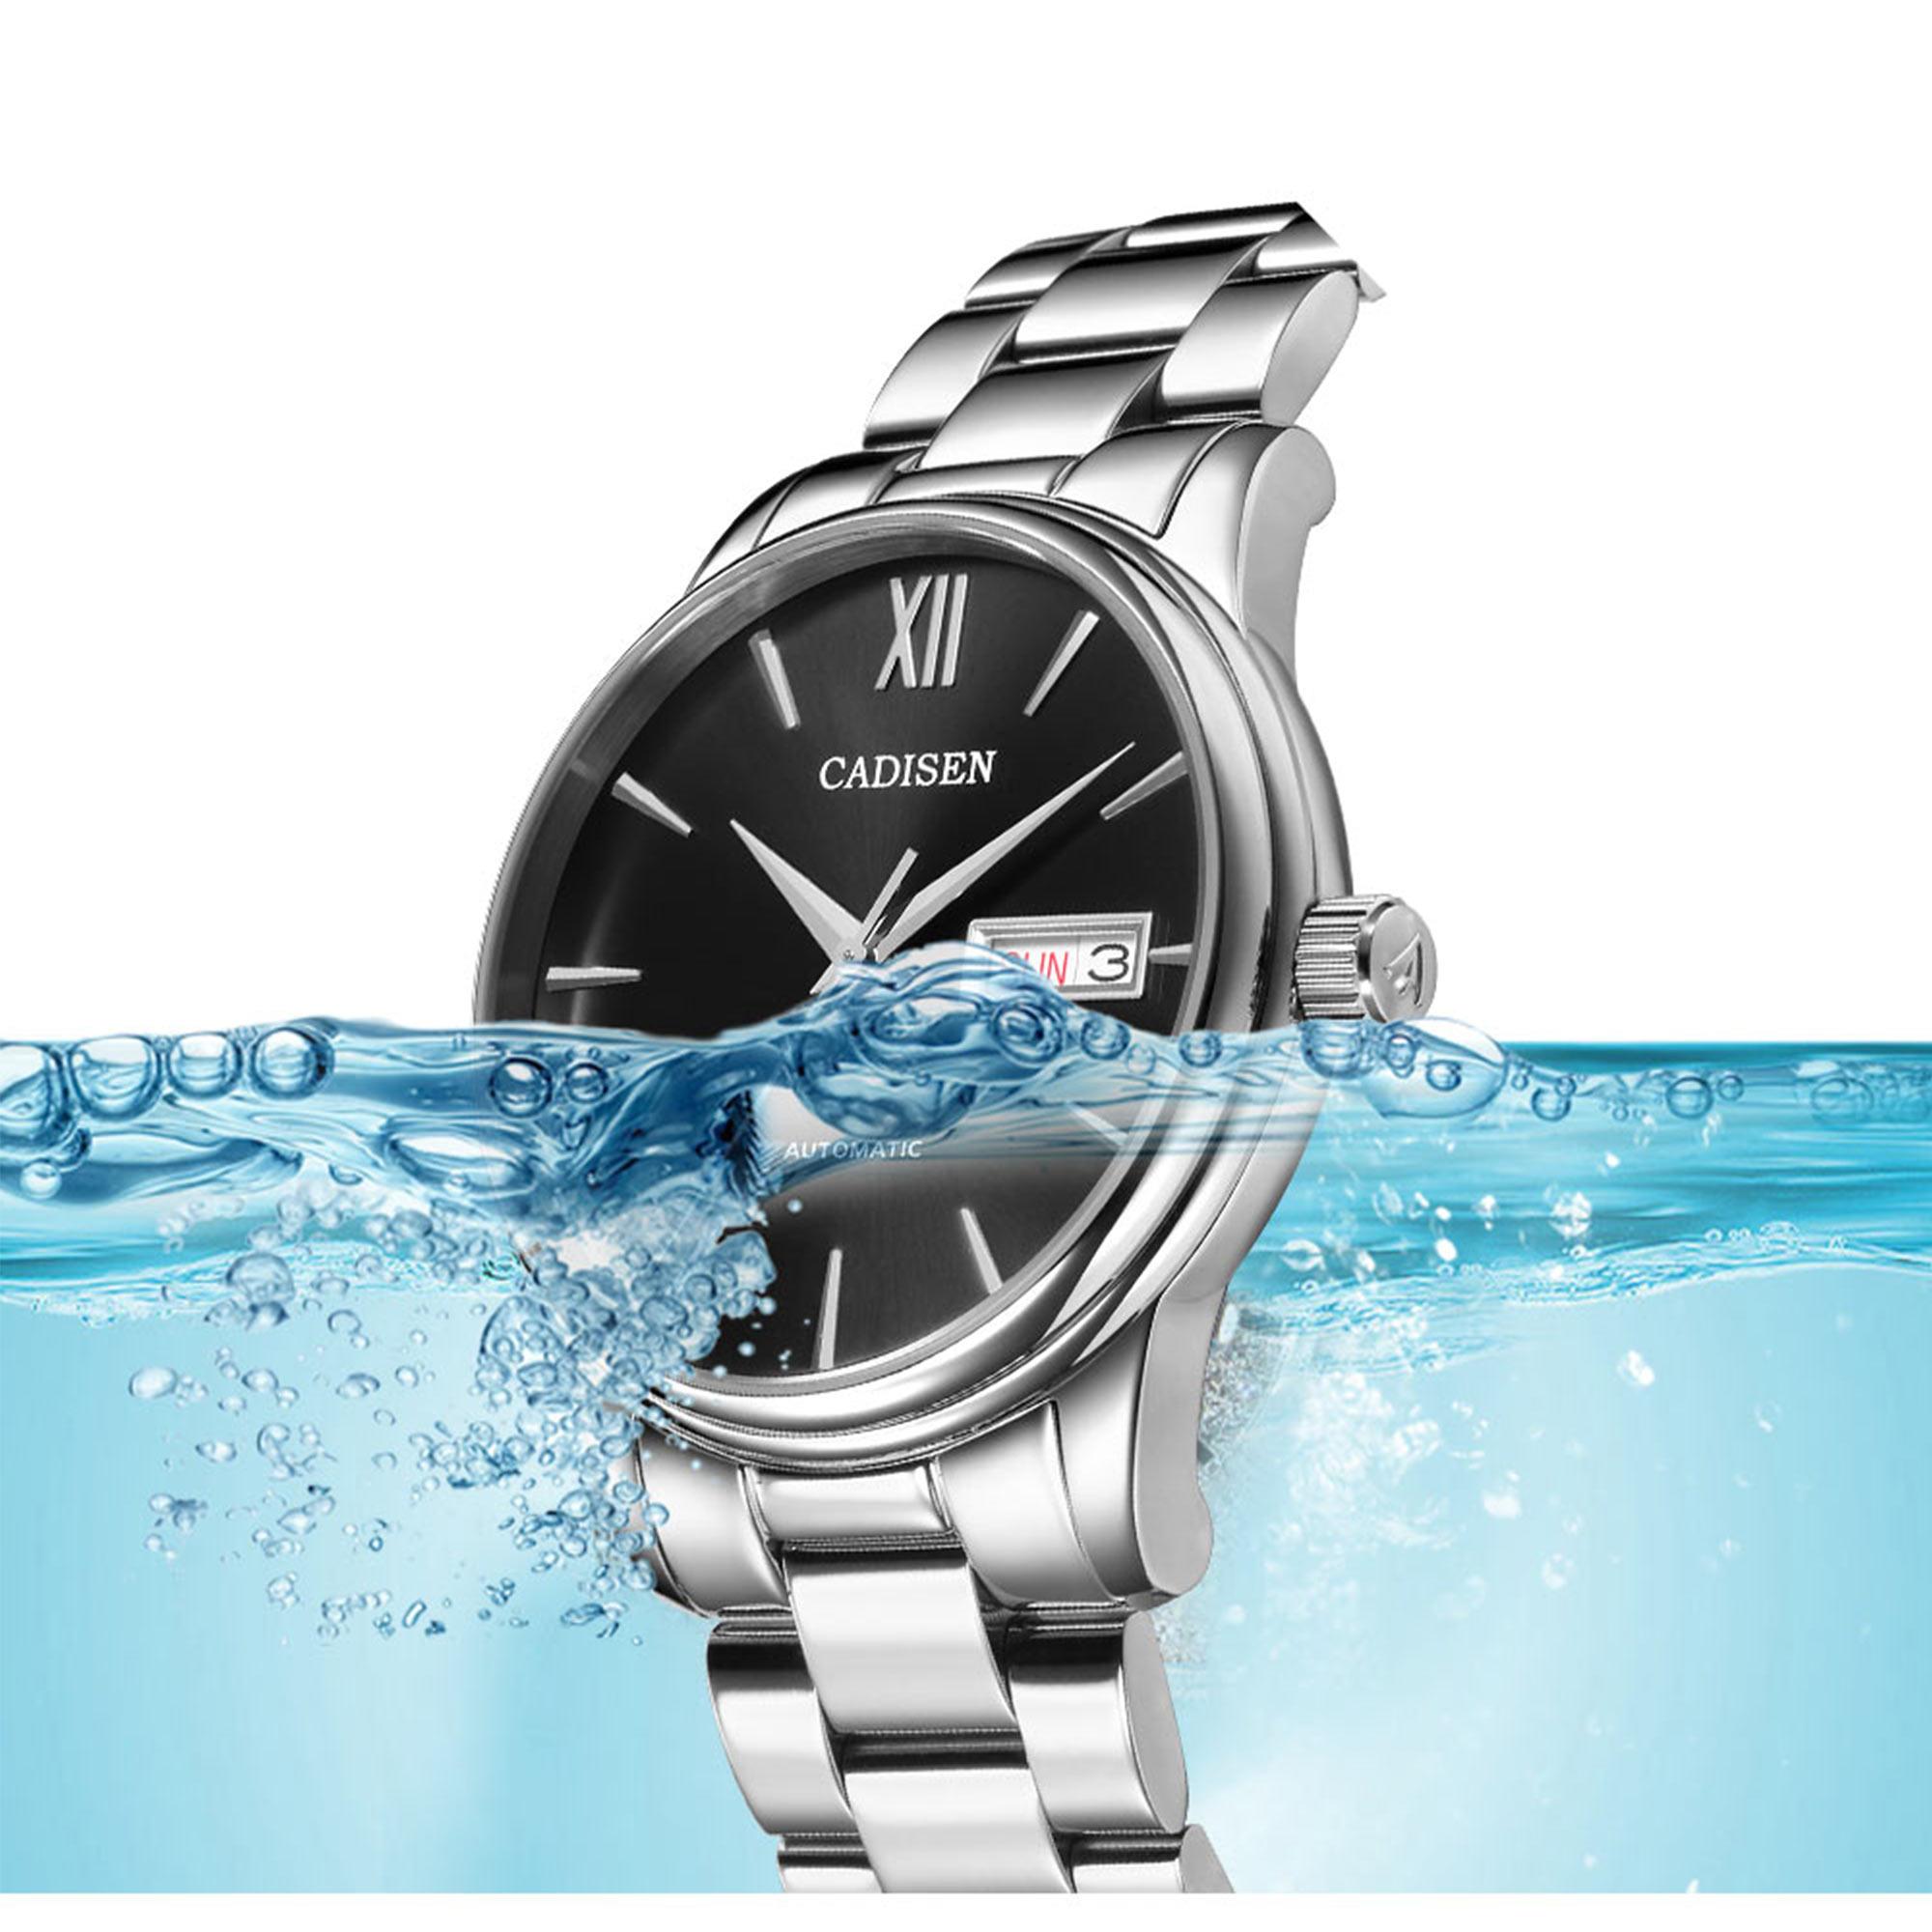 H9044d73739254fdbb962d9edecd8e1c4k CADISEN Men Watch Automatic Mechanical Watches Role Date Week Top Luxury Brand Japan NH36A Wrist watch Clock Relogio Masculino